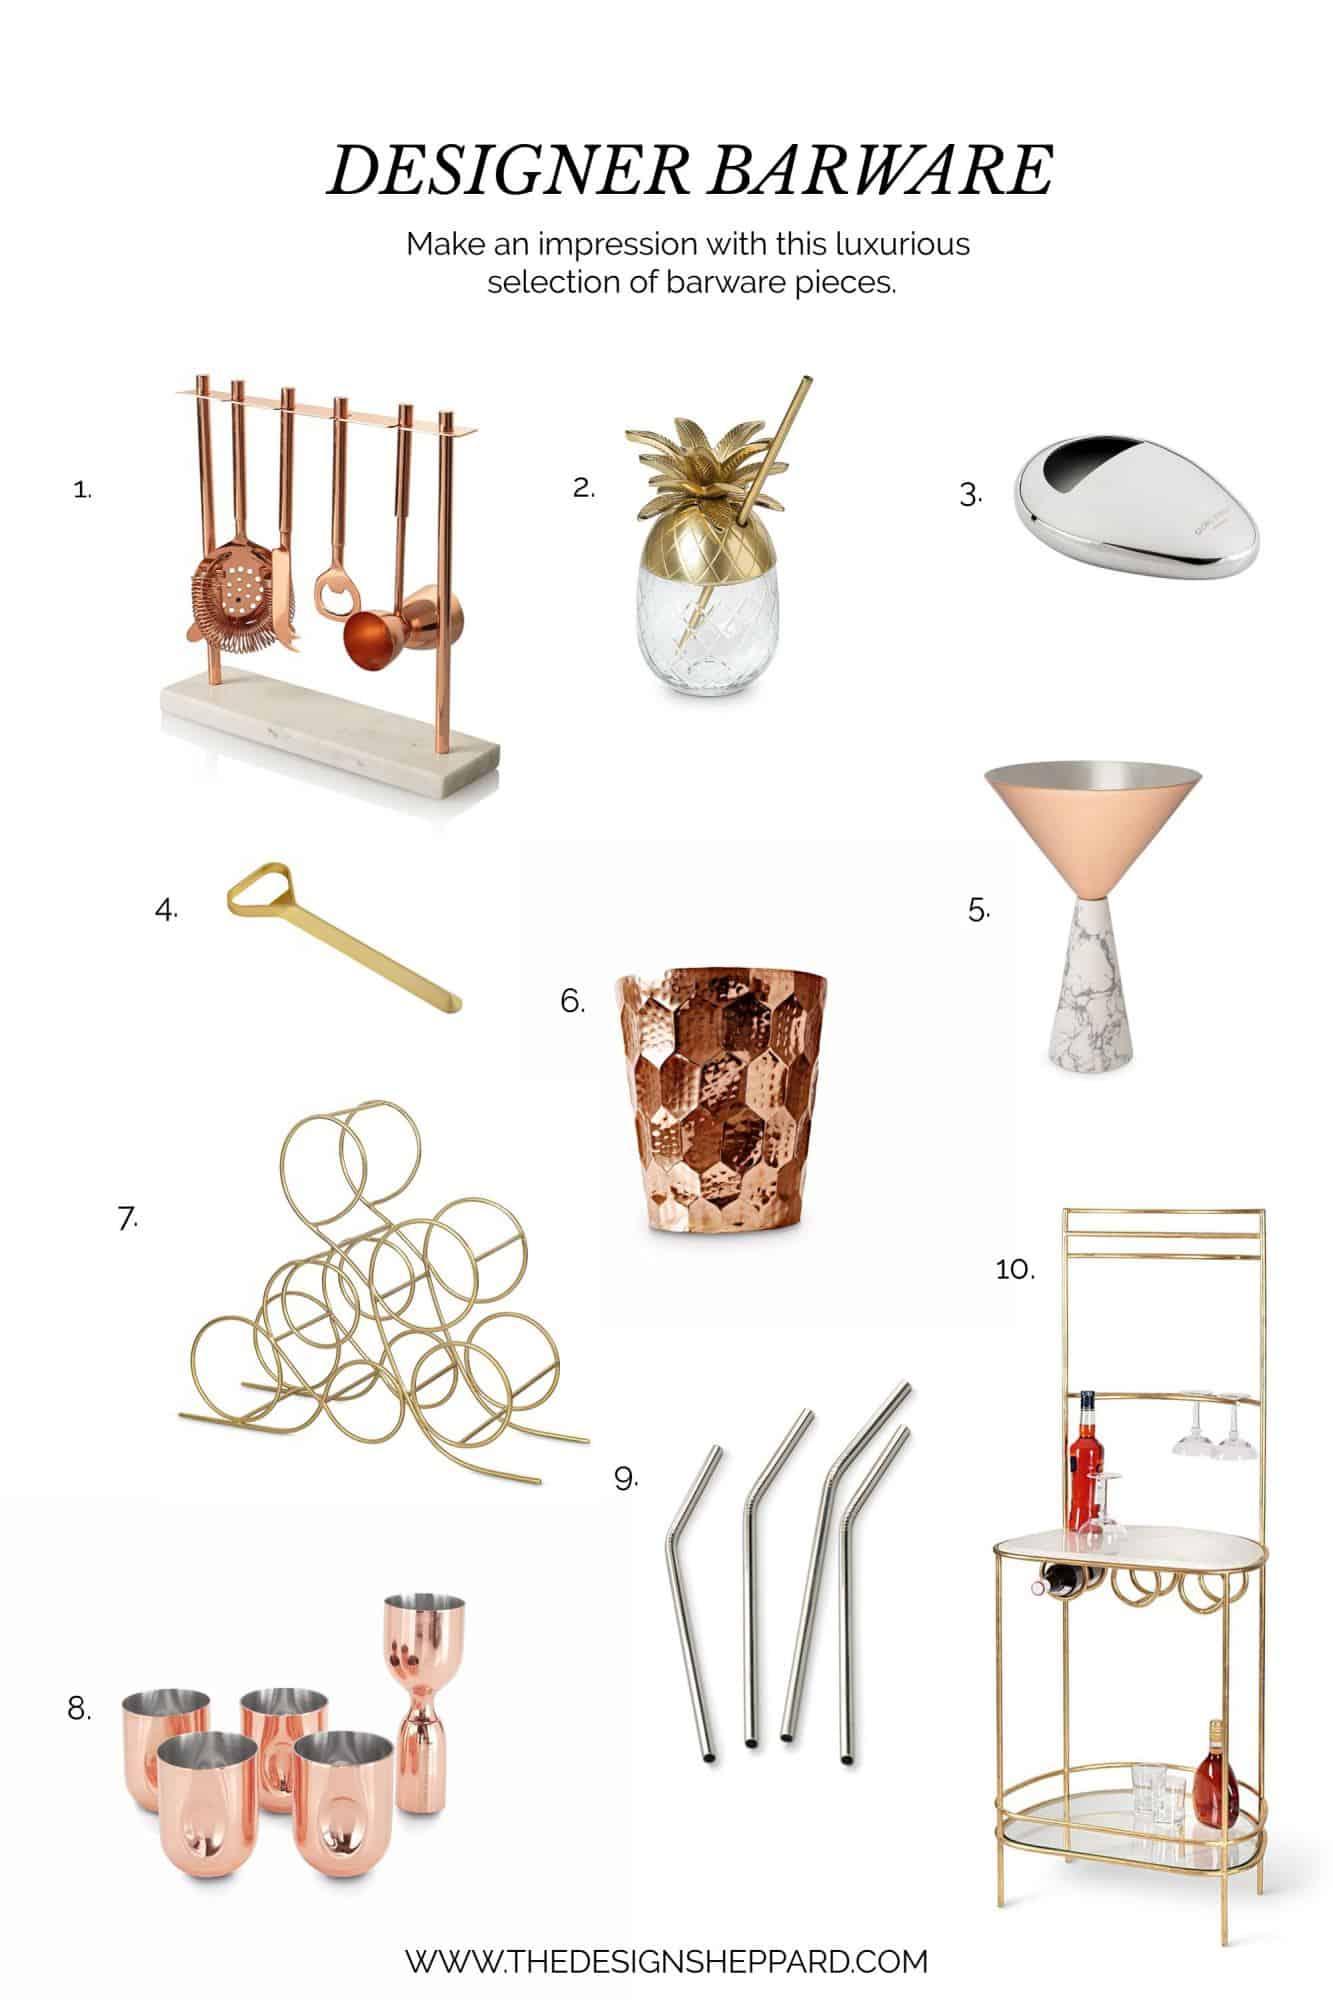 Designer Barware